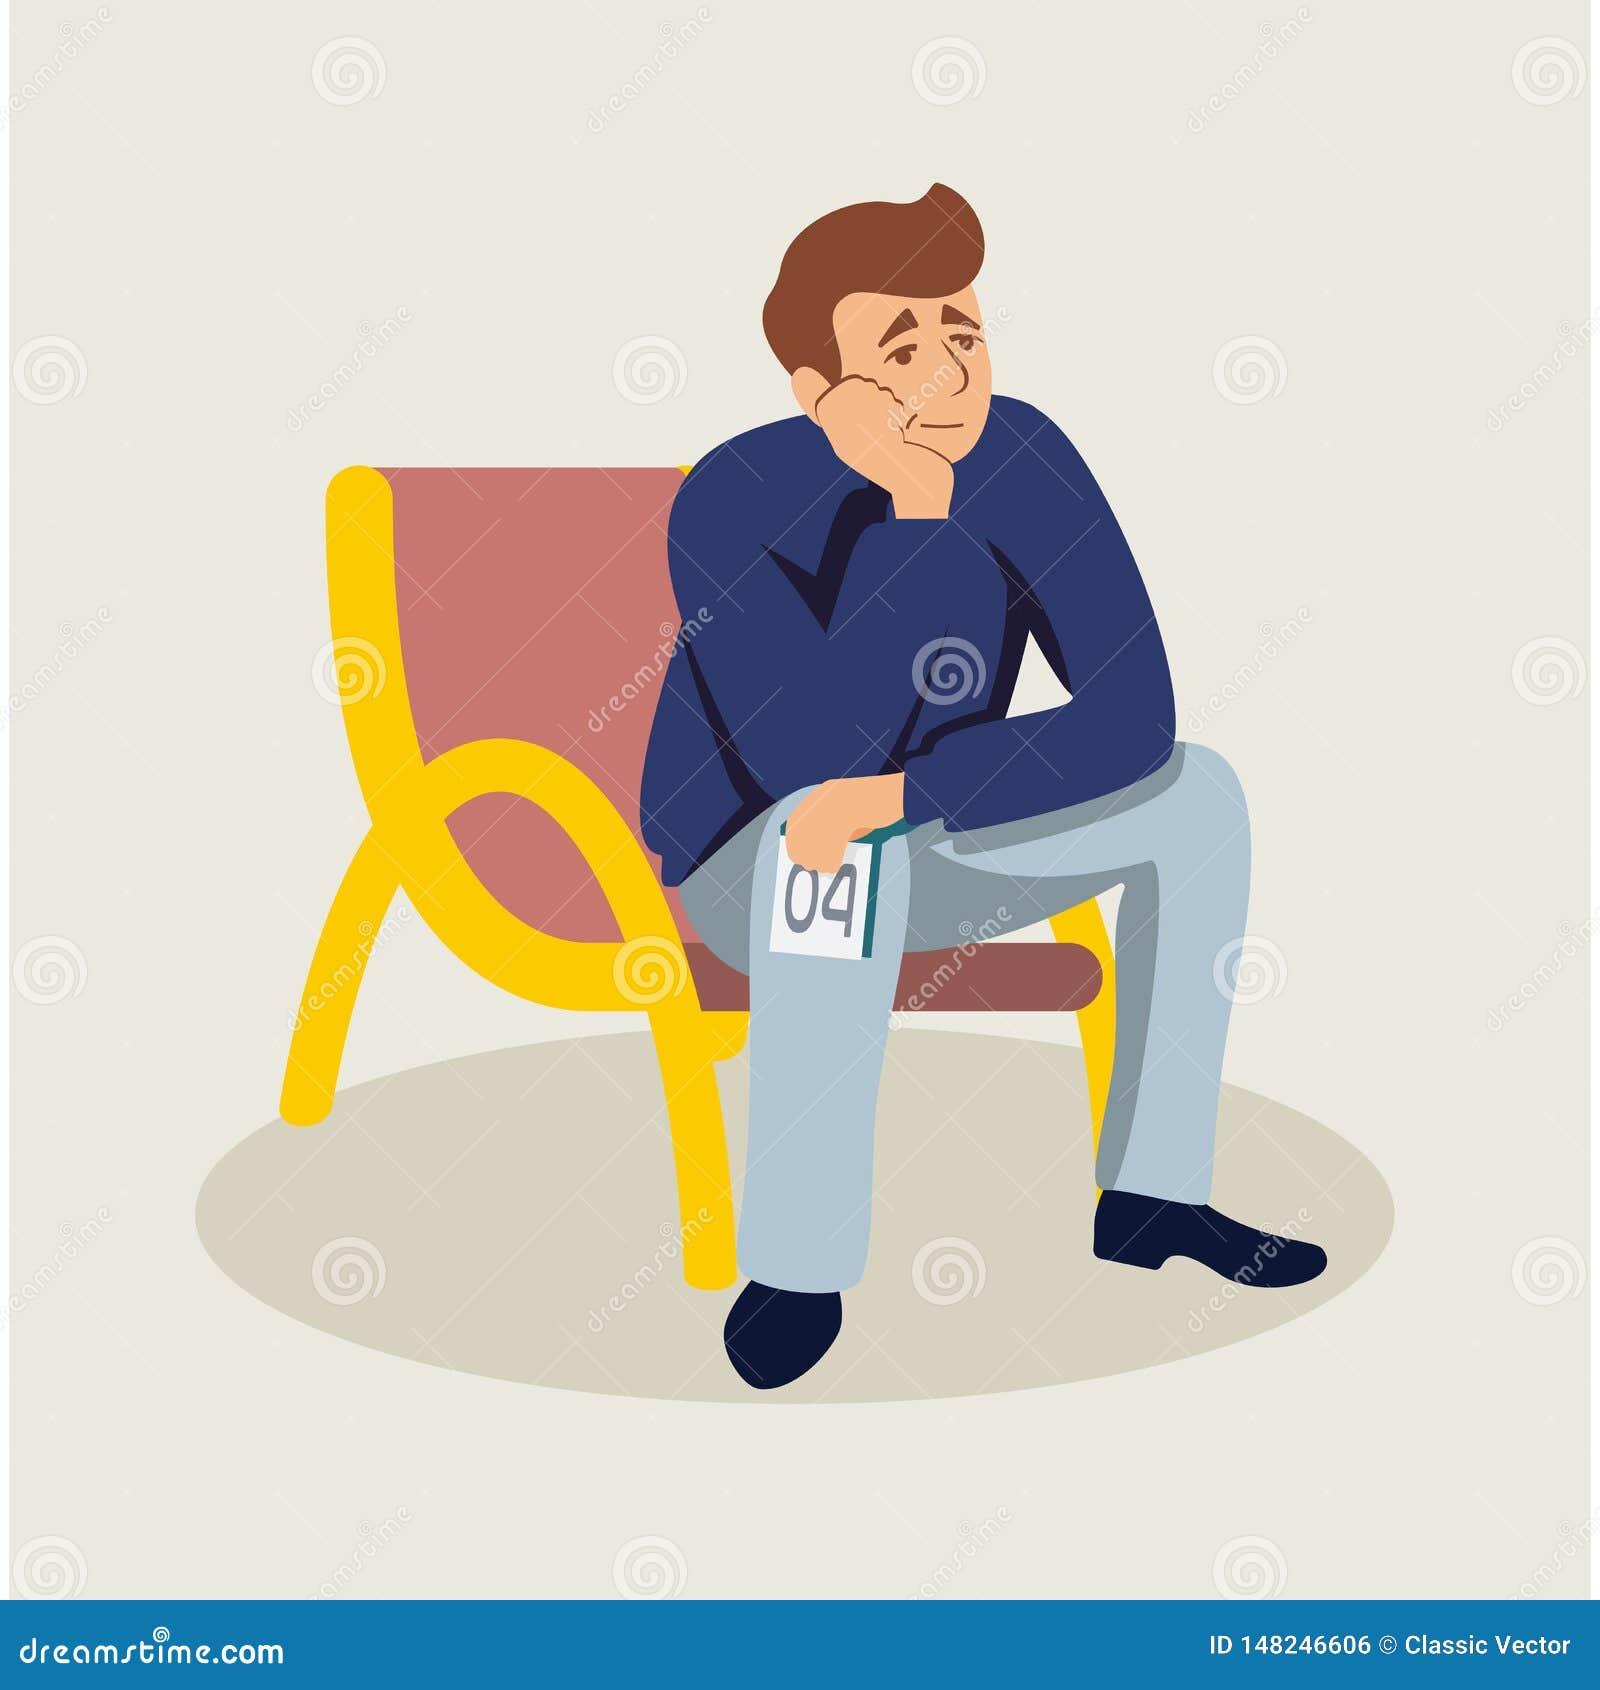 Man waiting in queue flat vector illustration